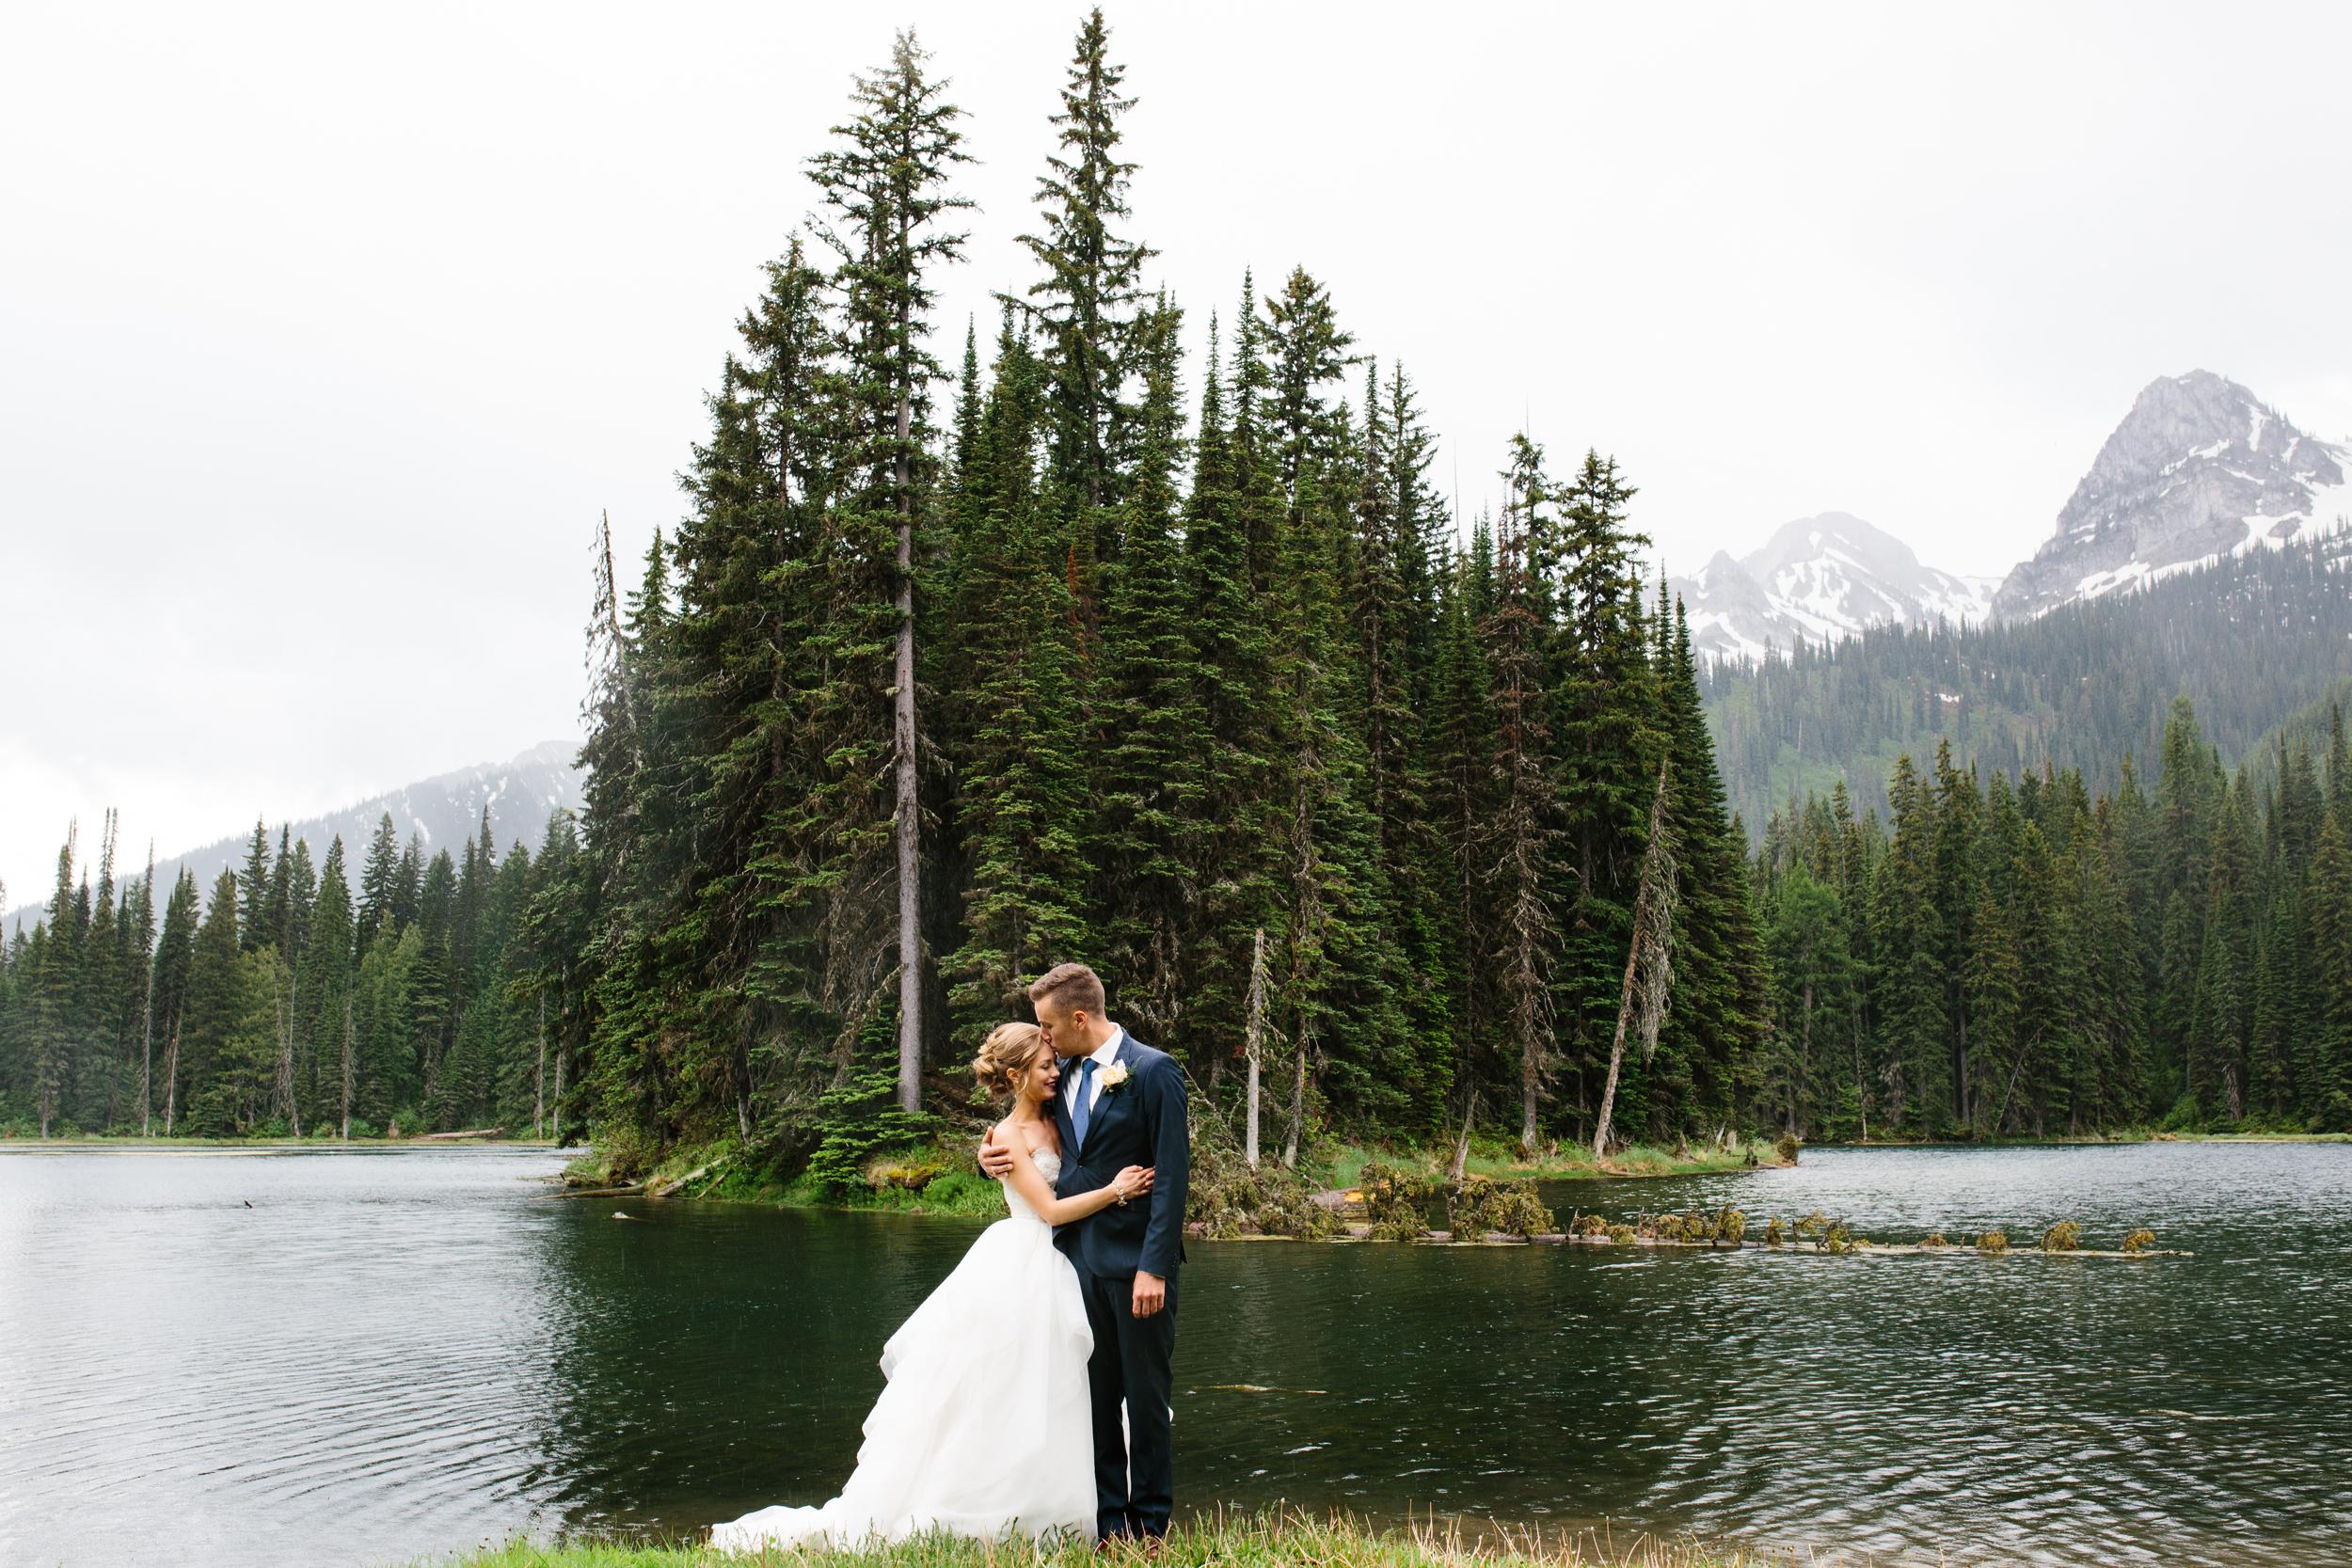 Island_Lake_Lodge_Wedding0014.jpg